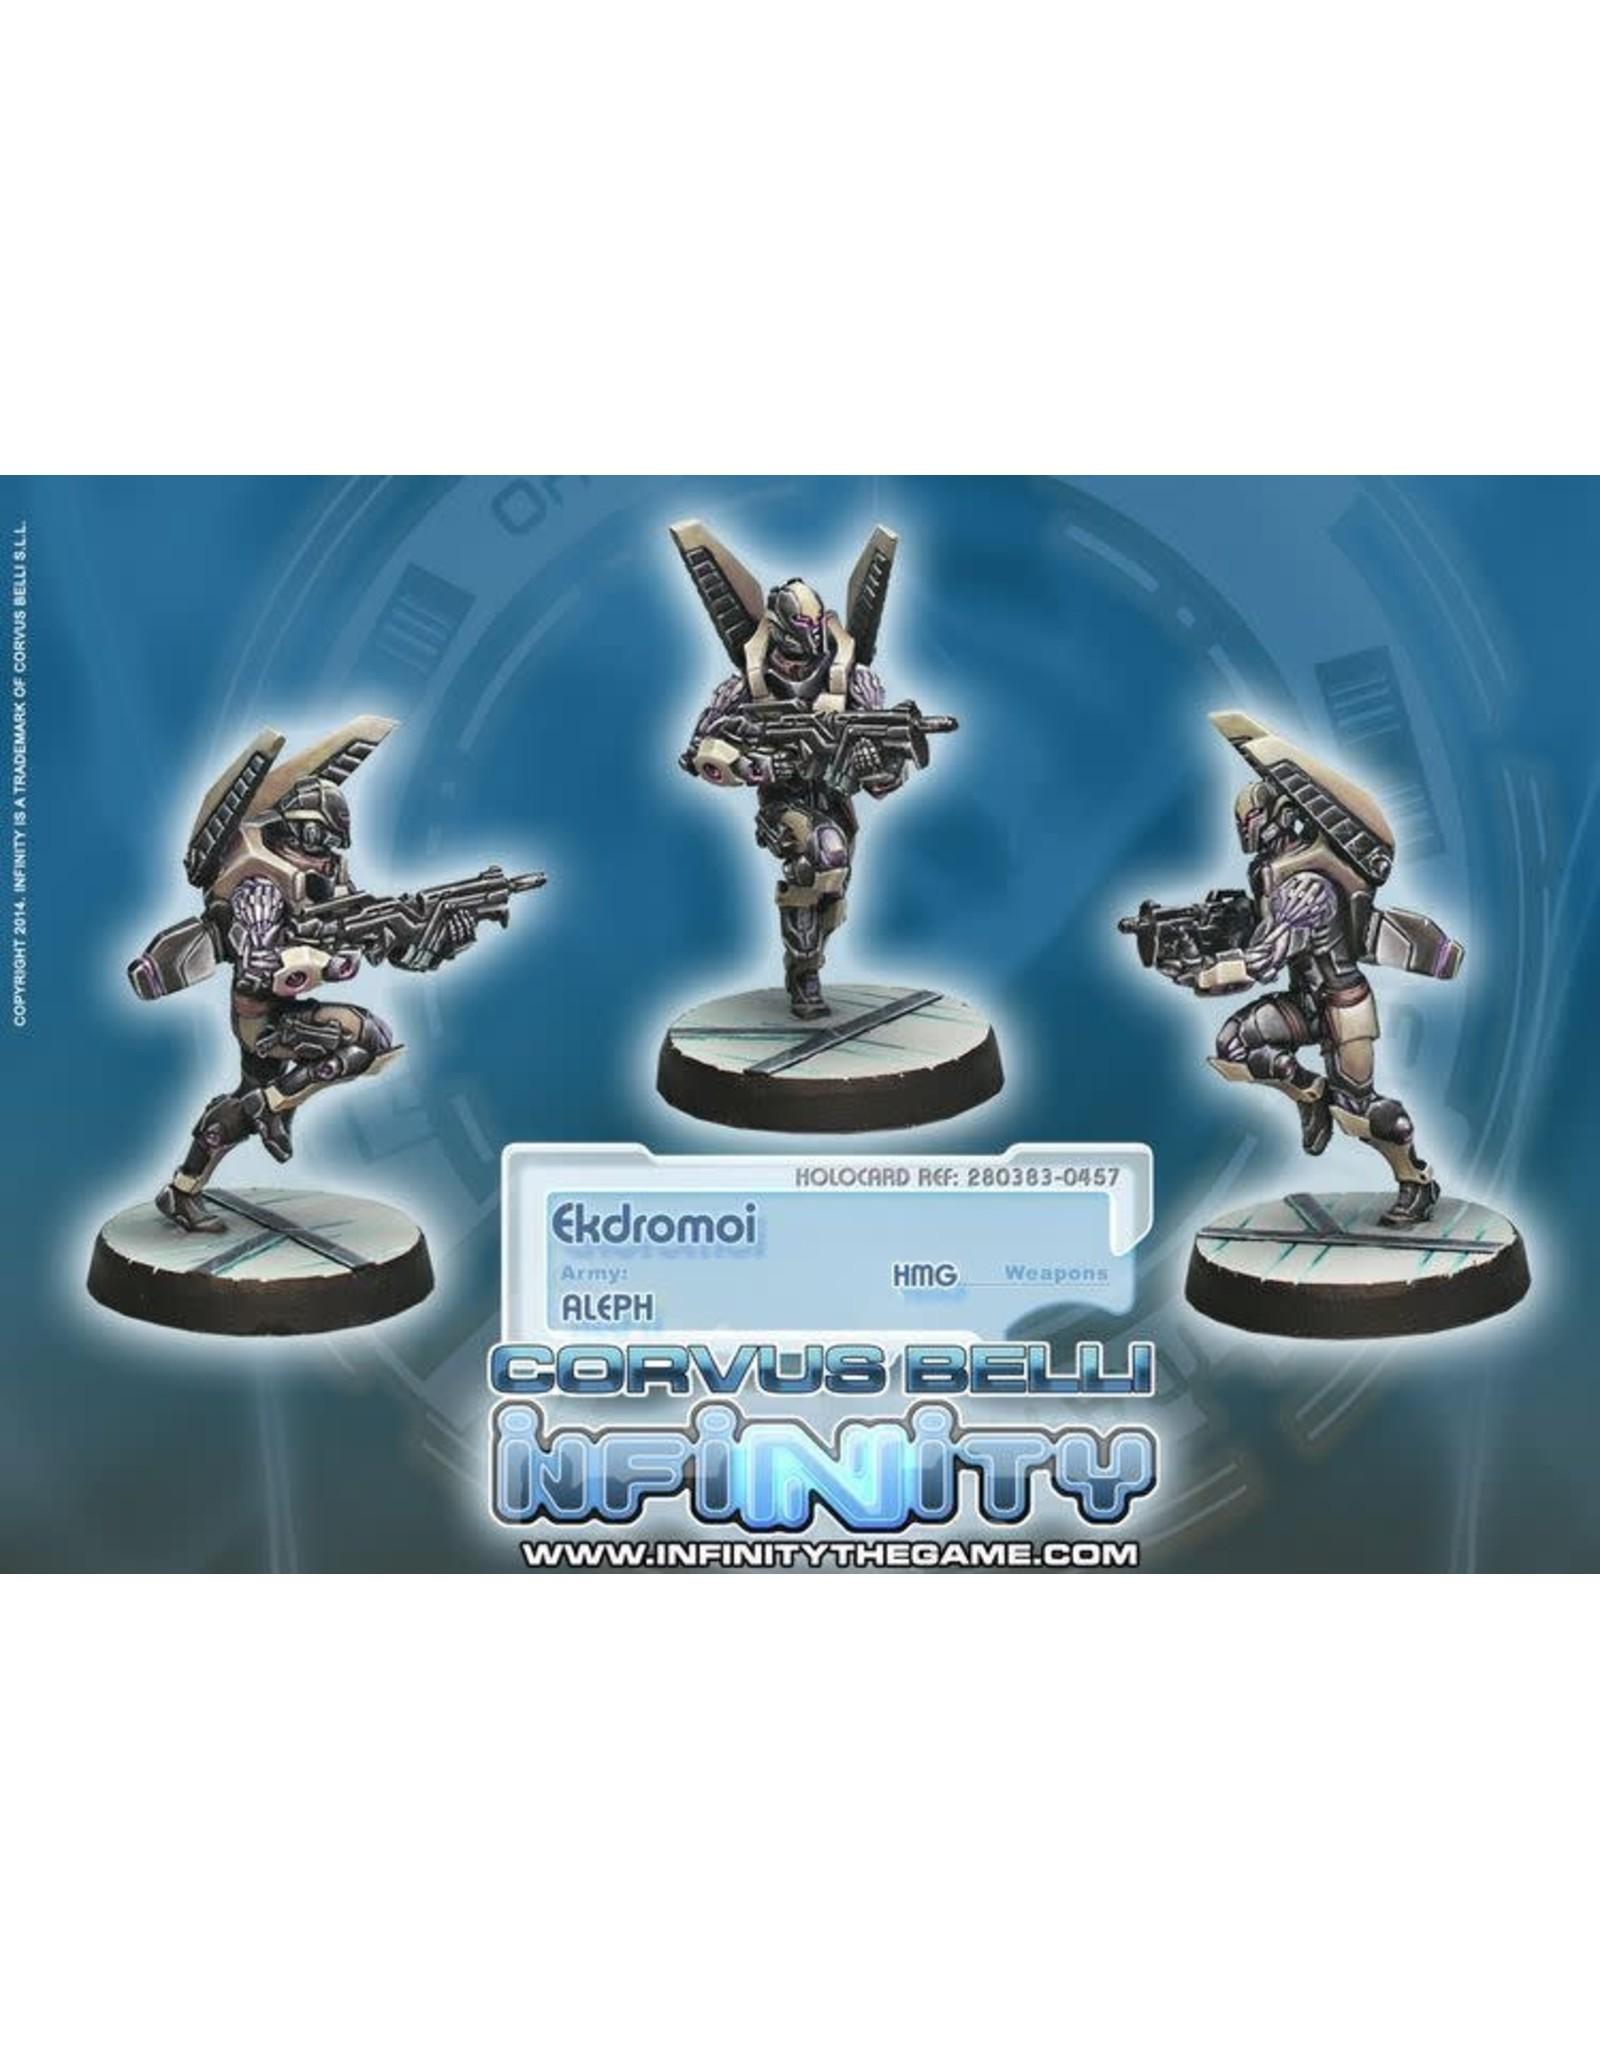 Corvus Belli Infinity: Enkdromoi (HMG)